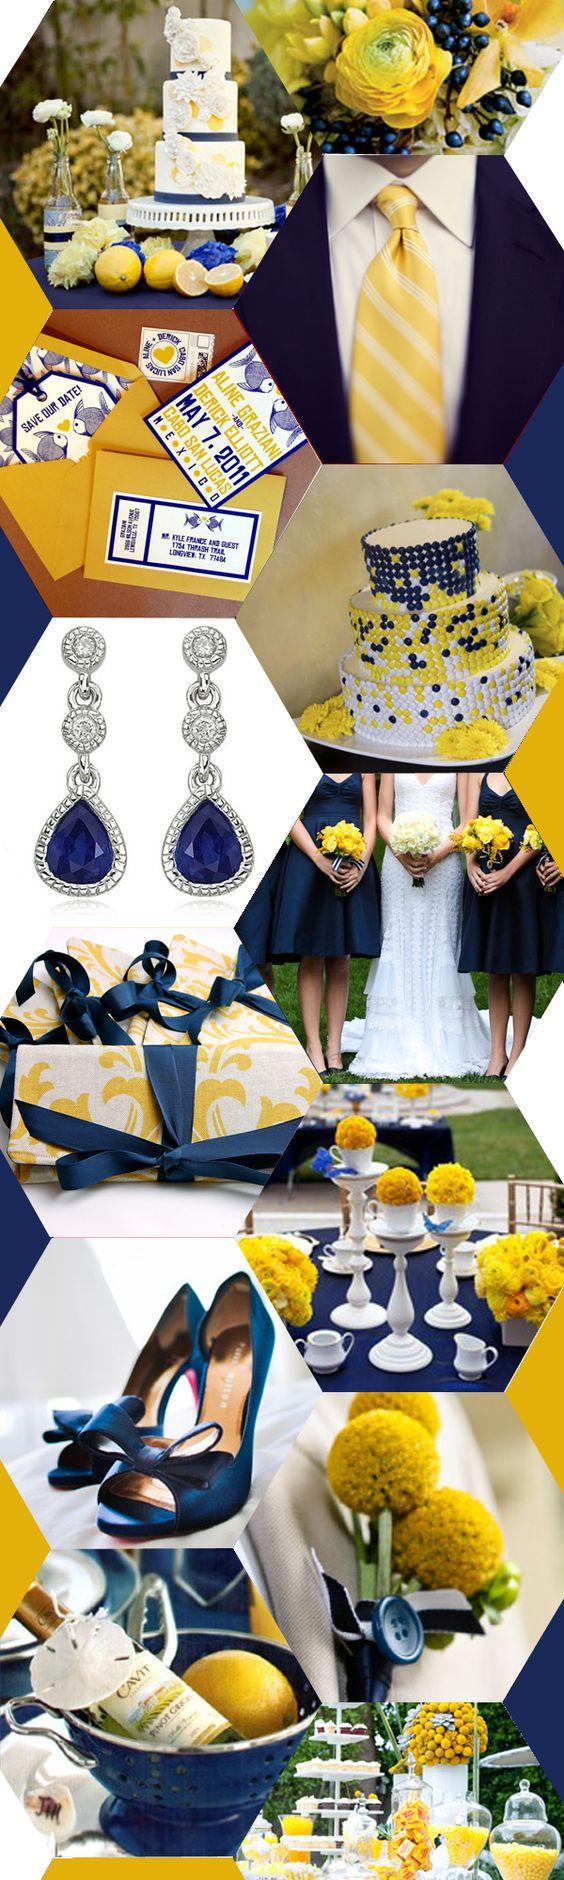 navy blue + yellow wedding inspiration. That M n m wedding cake is slightly ratchet though lol!